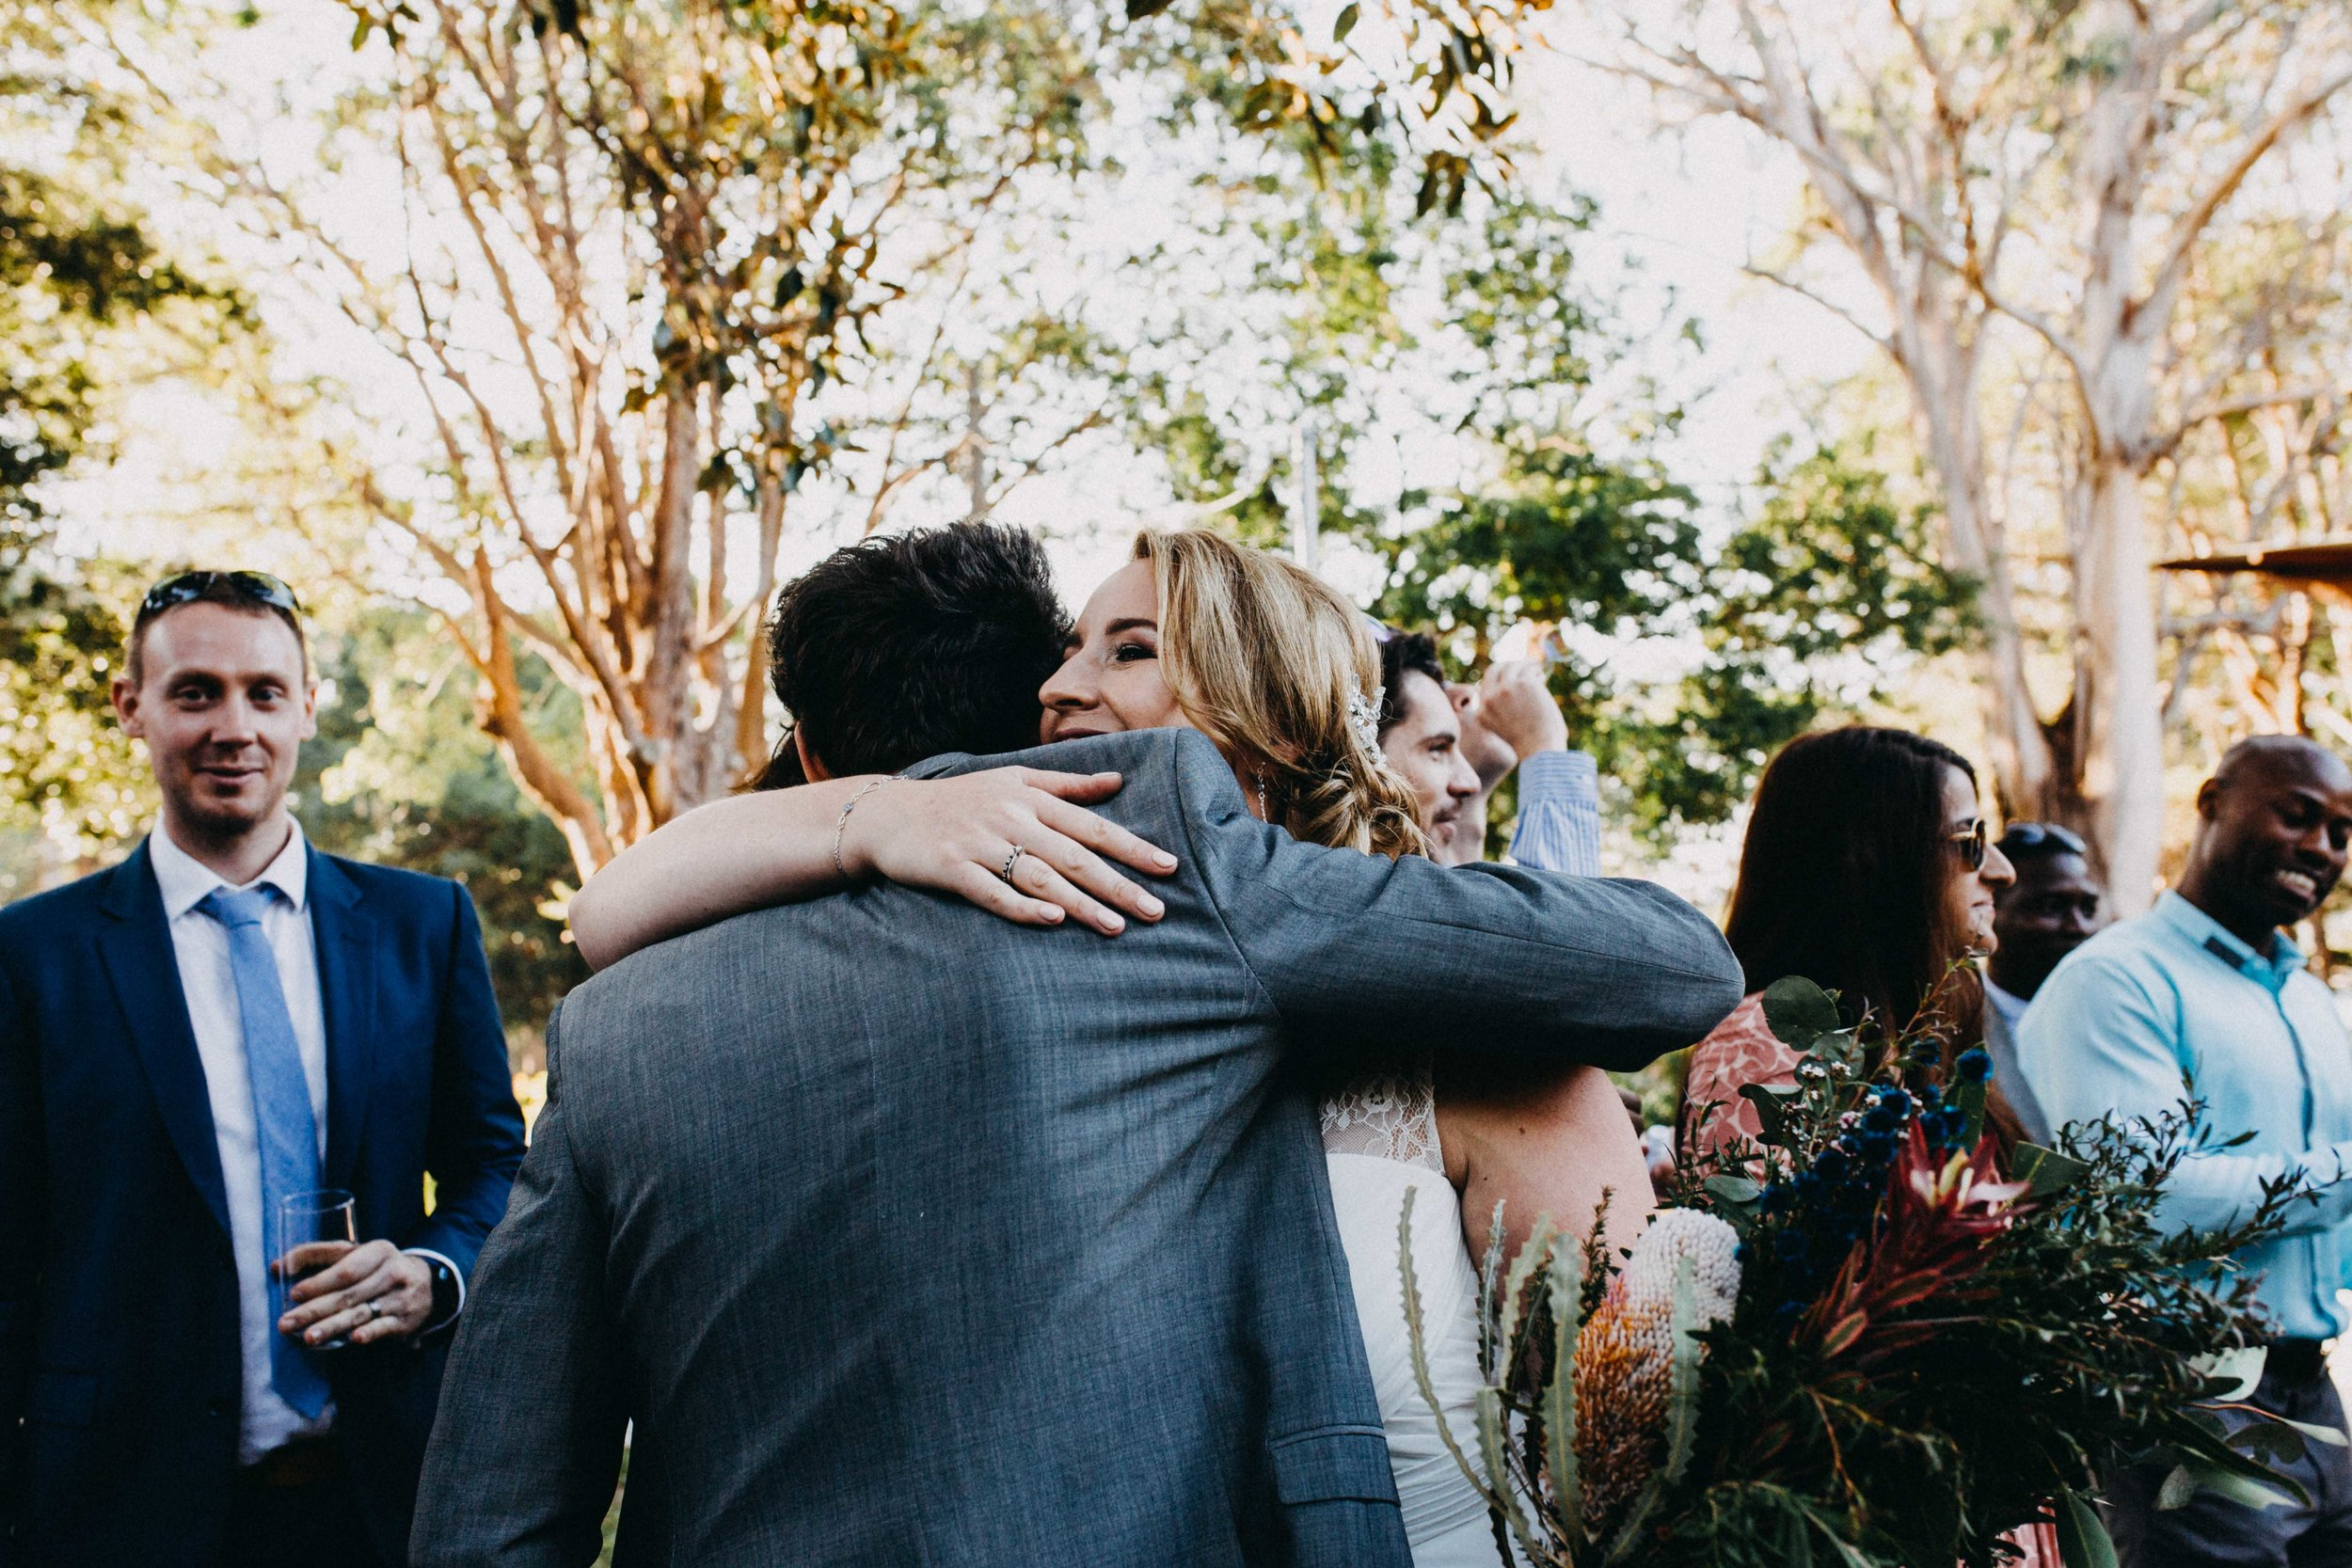 cabarita-park-sydney-wedding-emilyobrienphotography.net-38.jpg